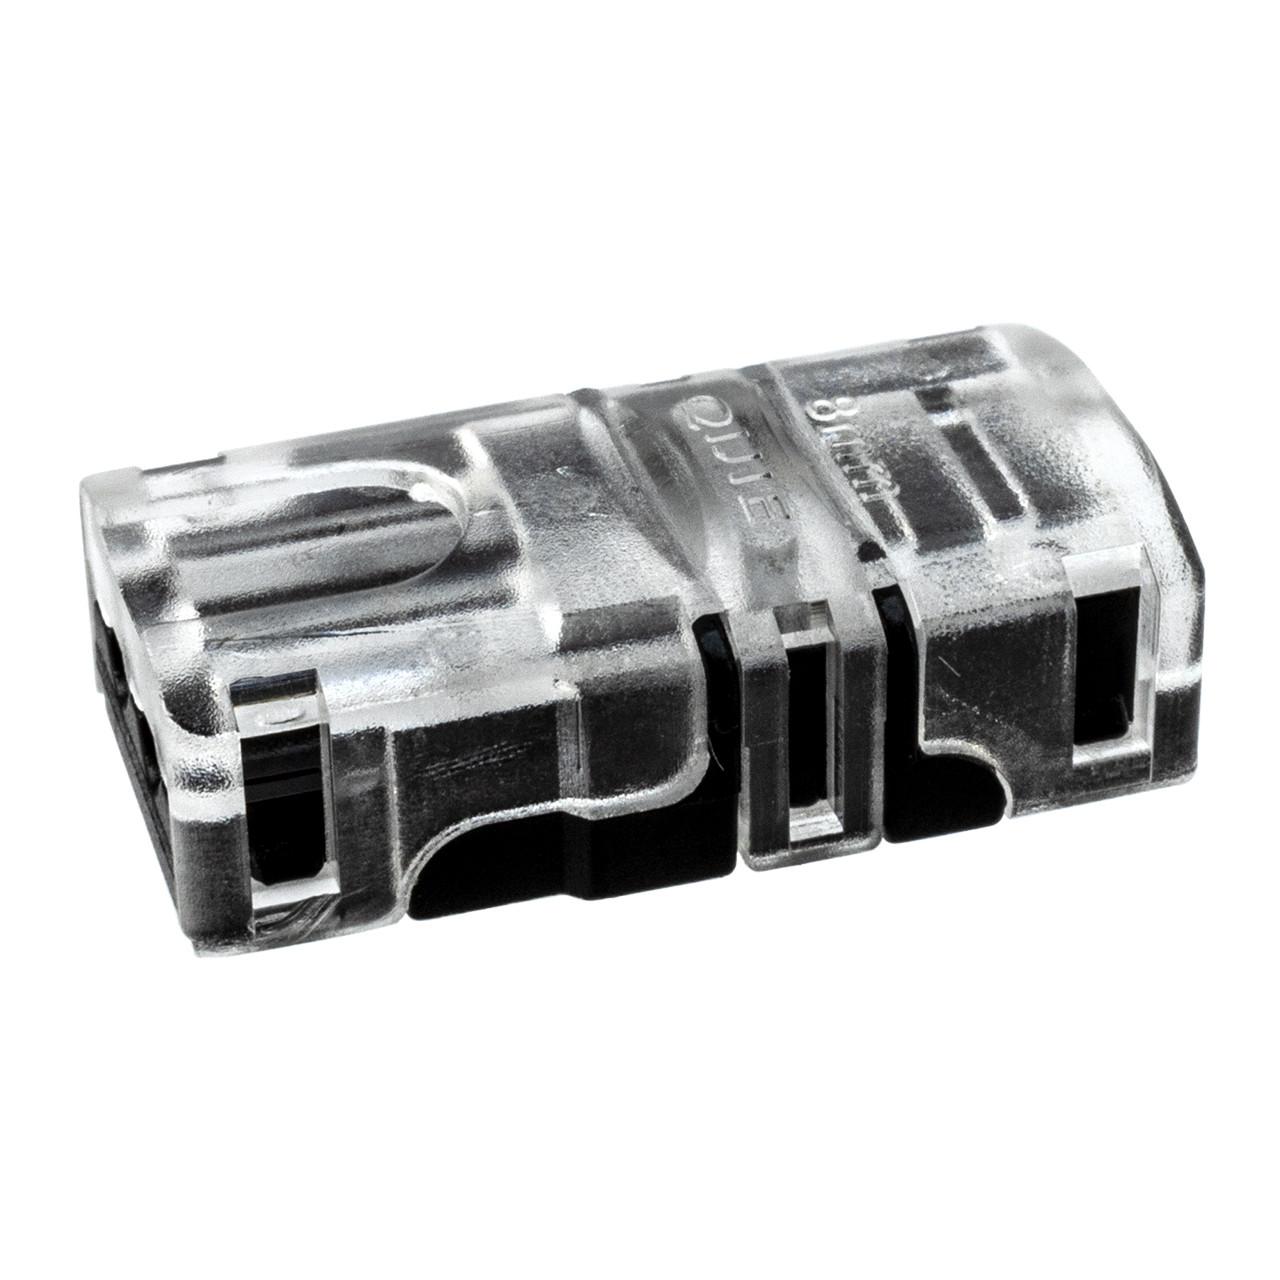 medium resolution of 12 volt led strip light hippo power connector